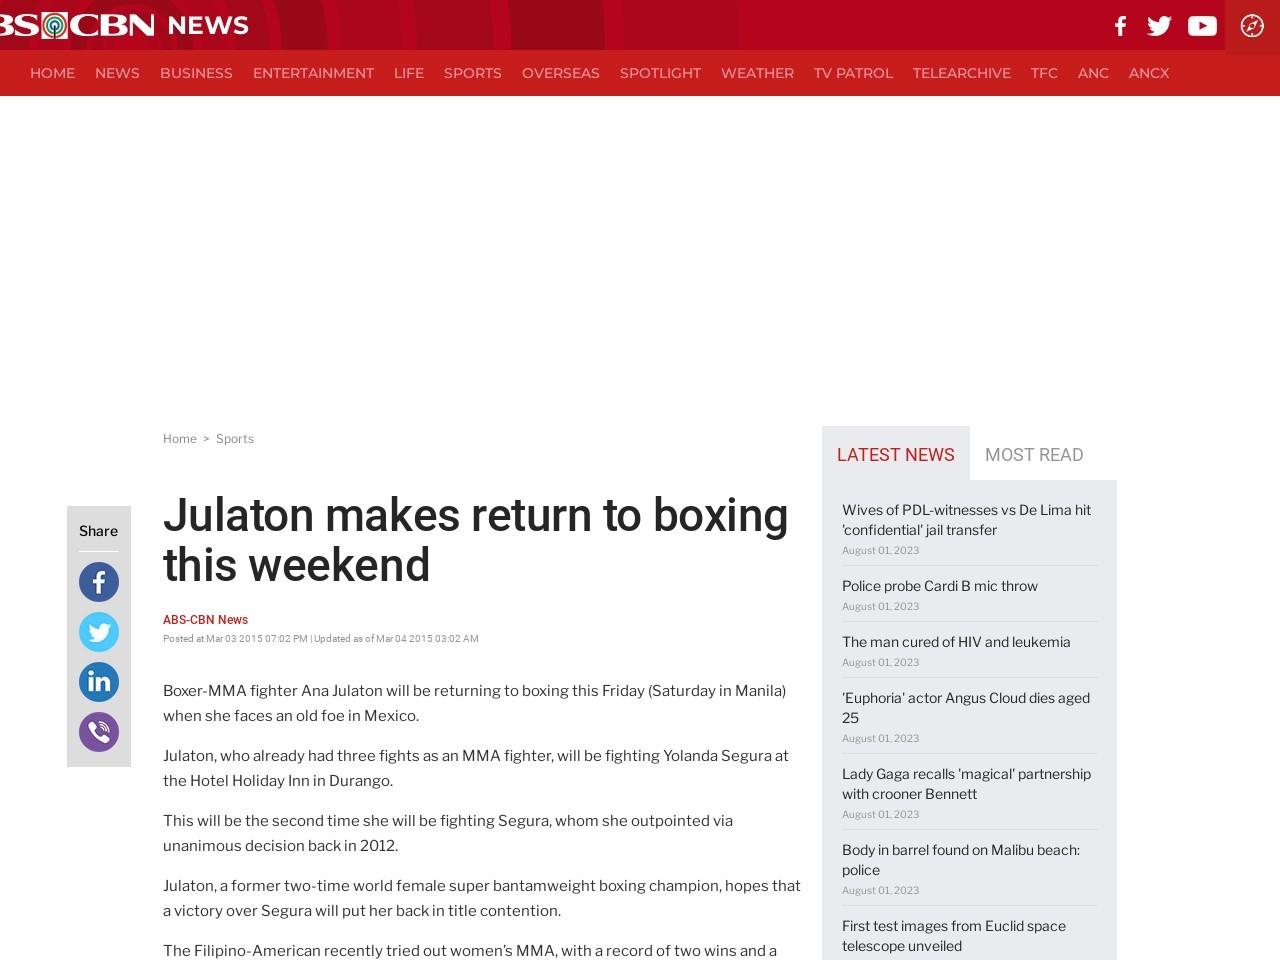 Julaton makes return to boxing this weekend